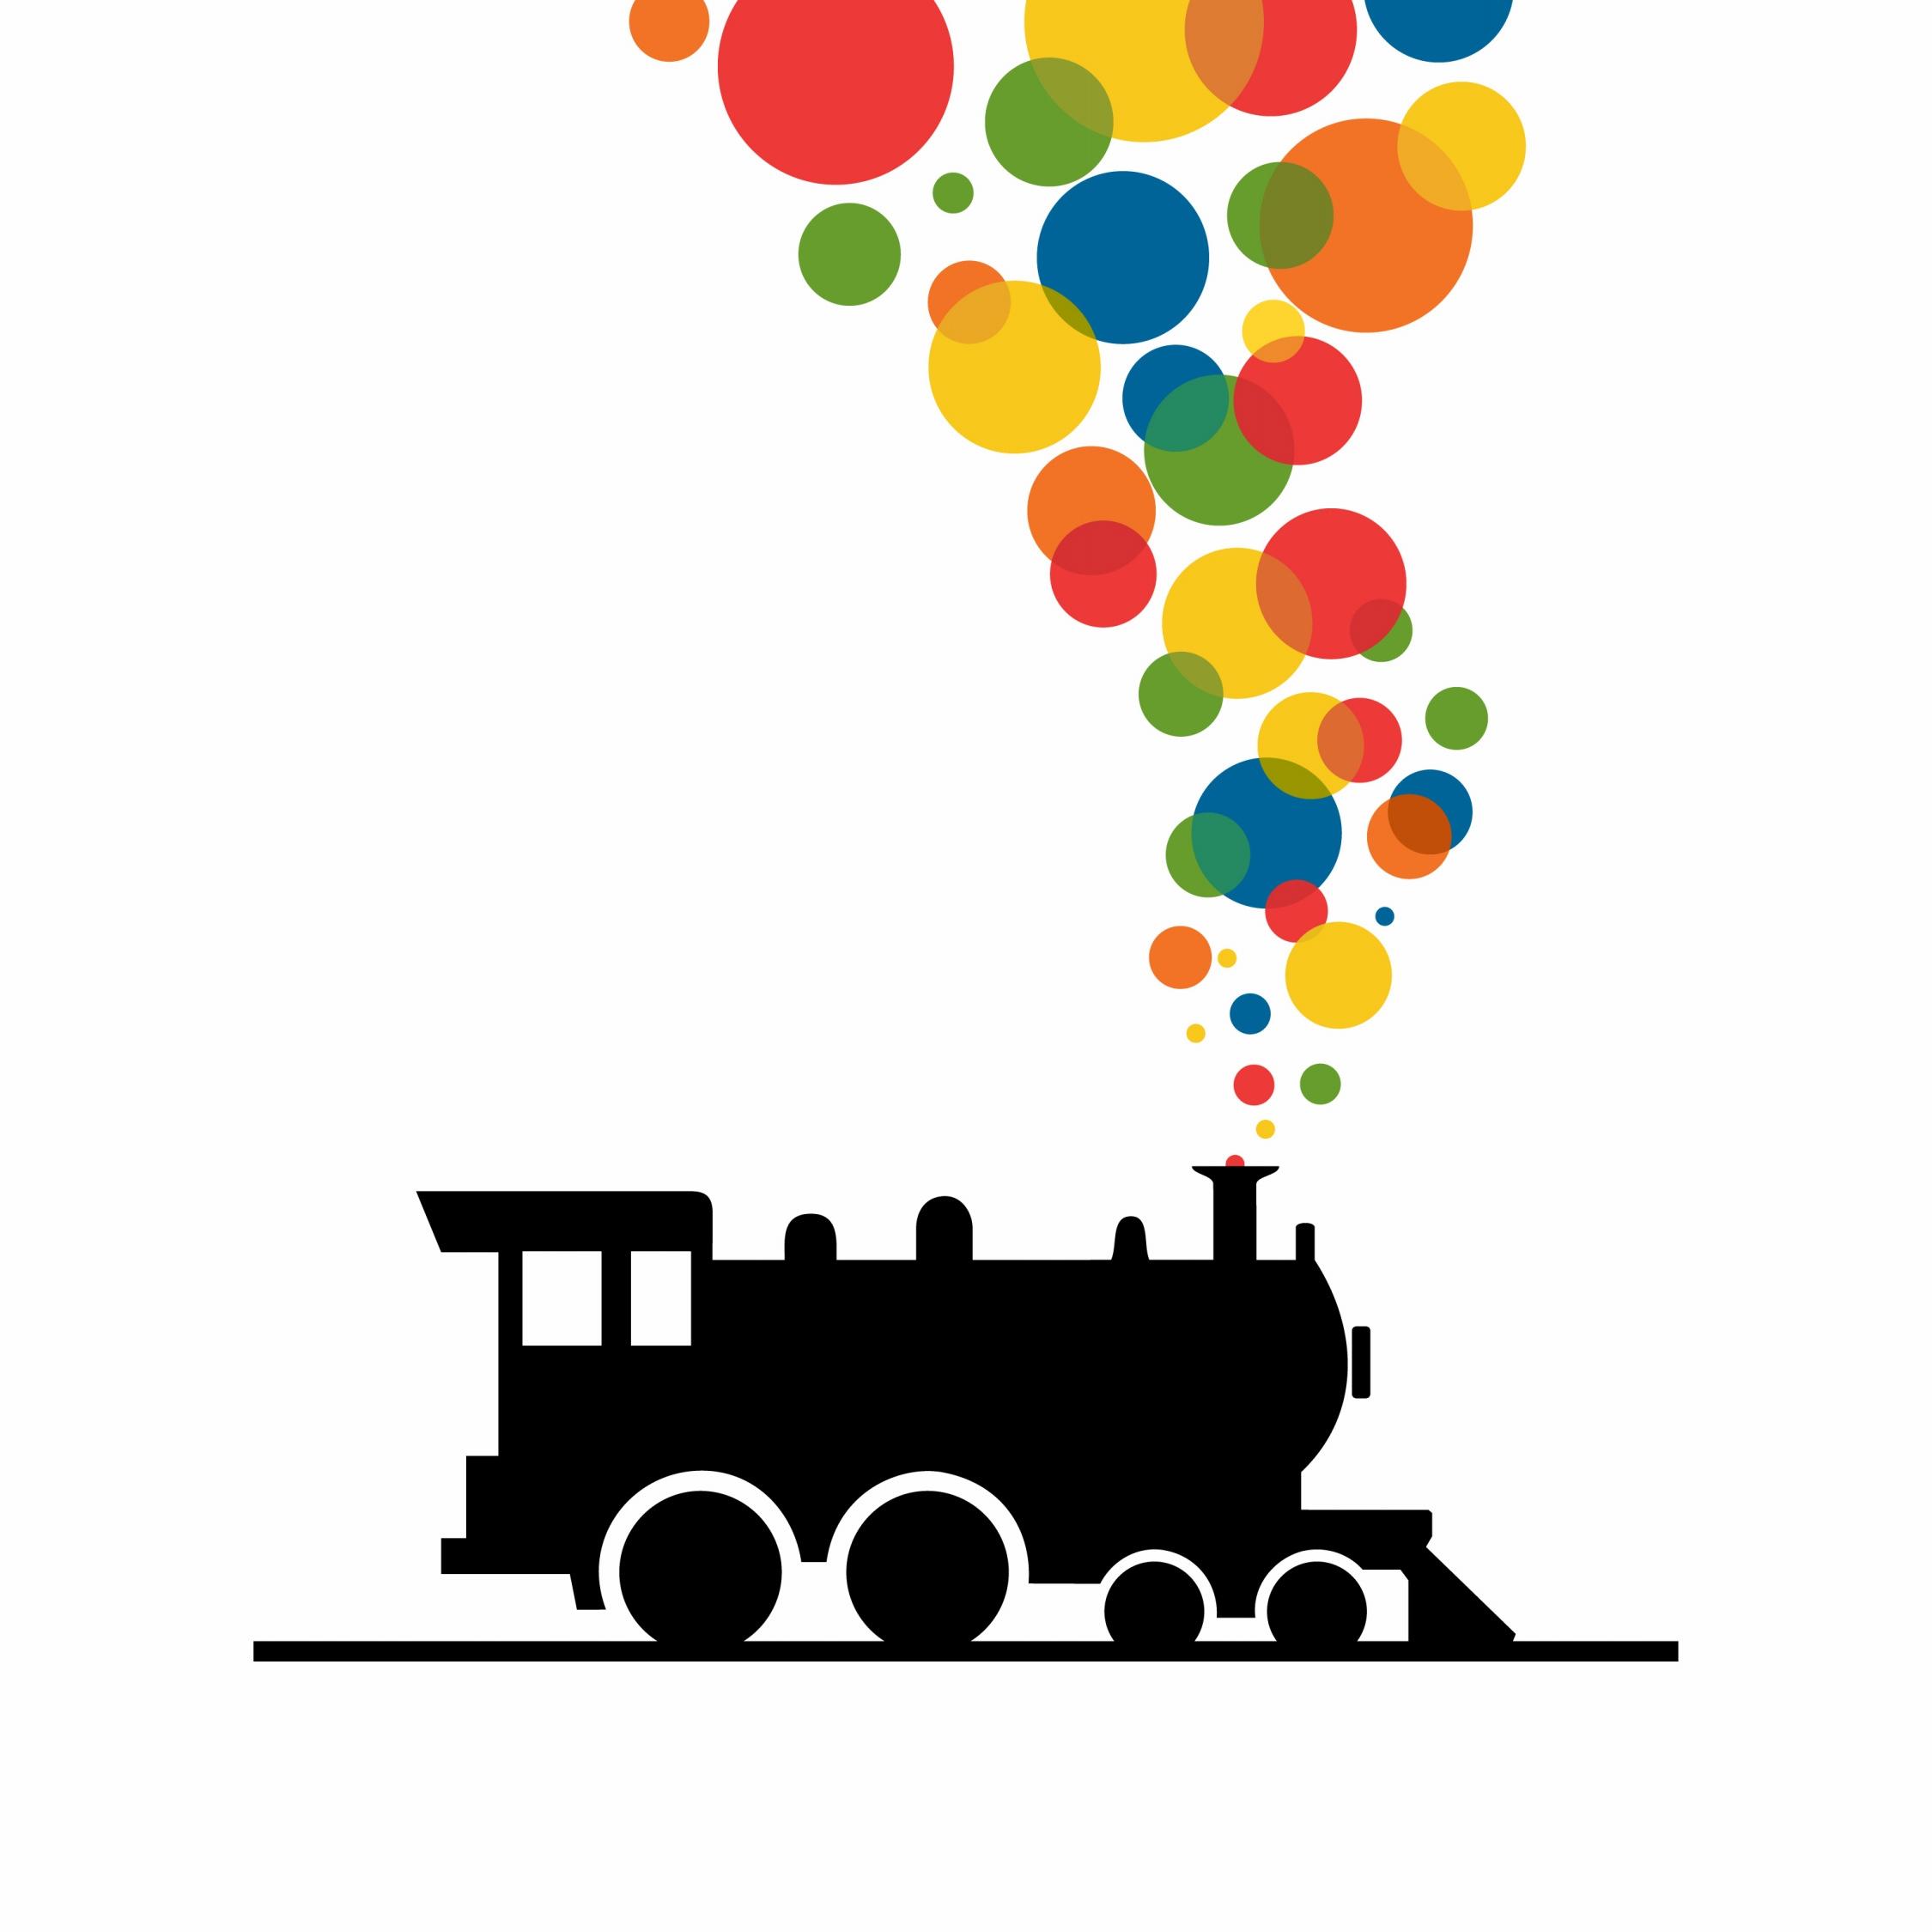 Train logos clipart banner black and white stock Train Logos Clipart - Free Clipart banner black and white stock